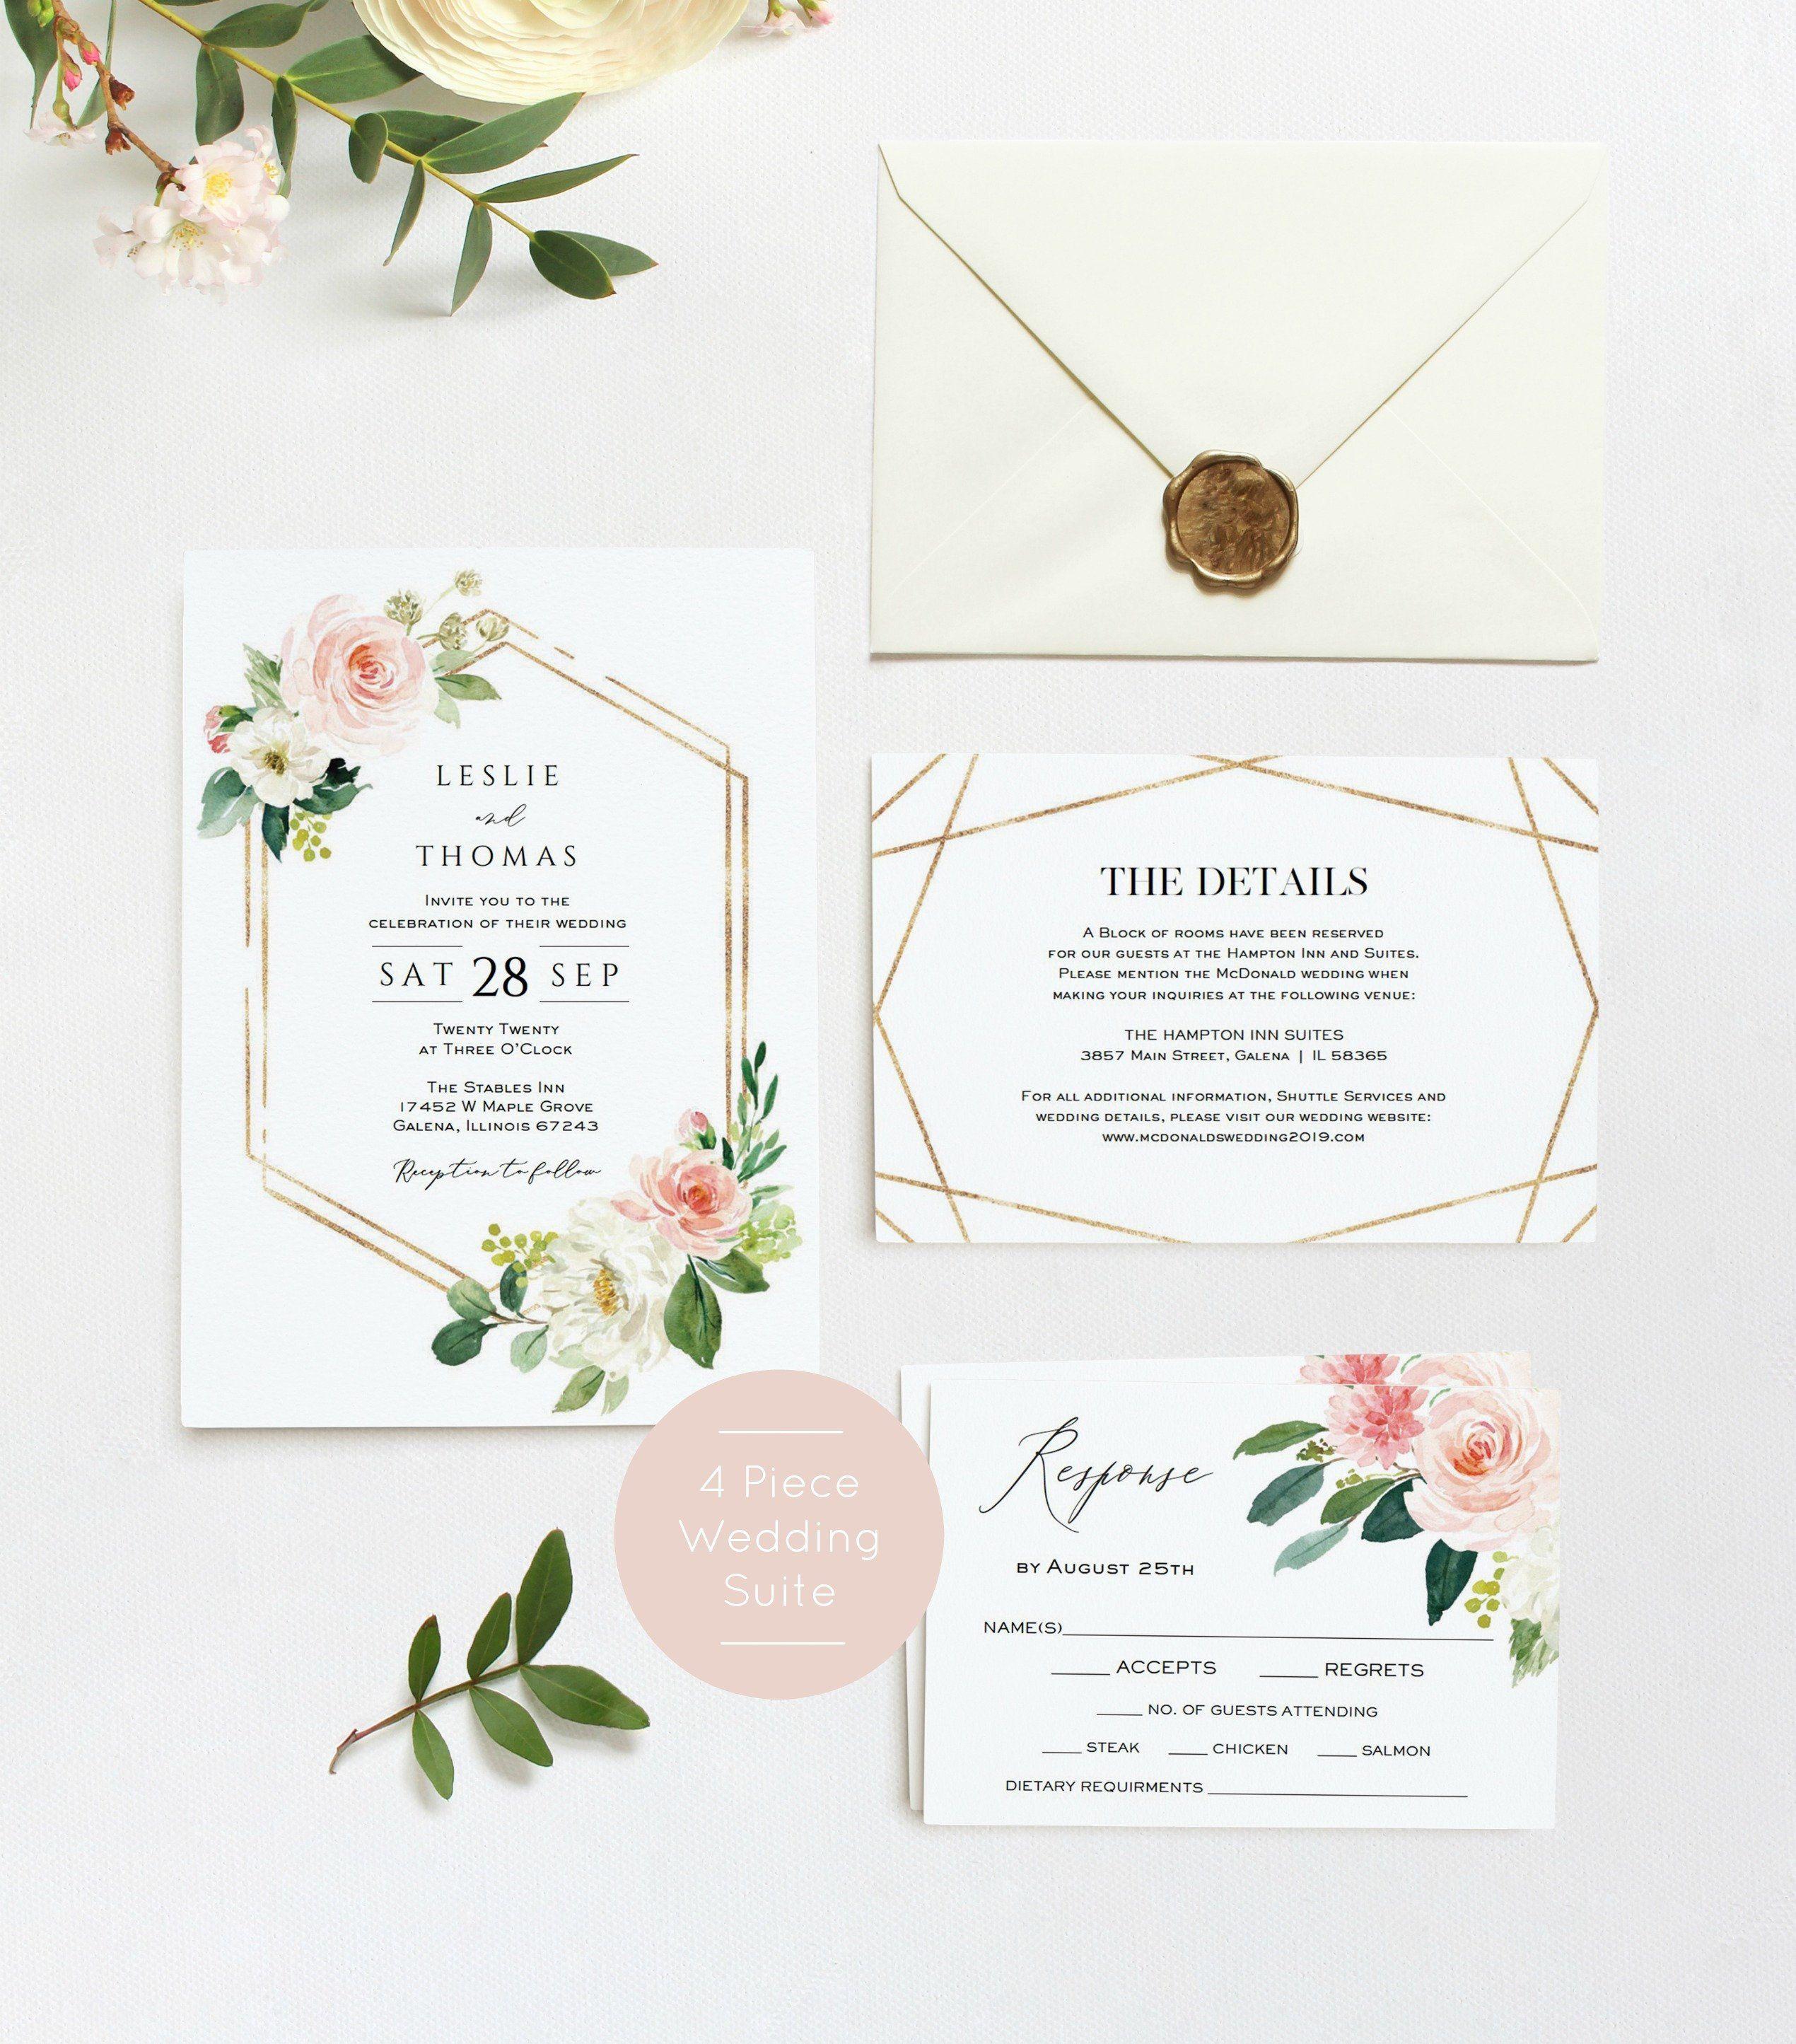 Roses Blush Pink and Grey Wedding Invitation Willow Editable Wedding Invitation Printable Watercolour Wedding Invitation template